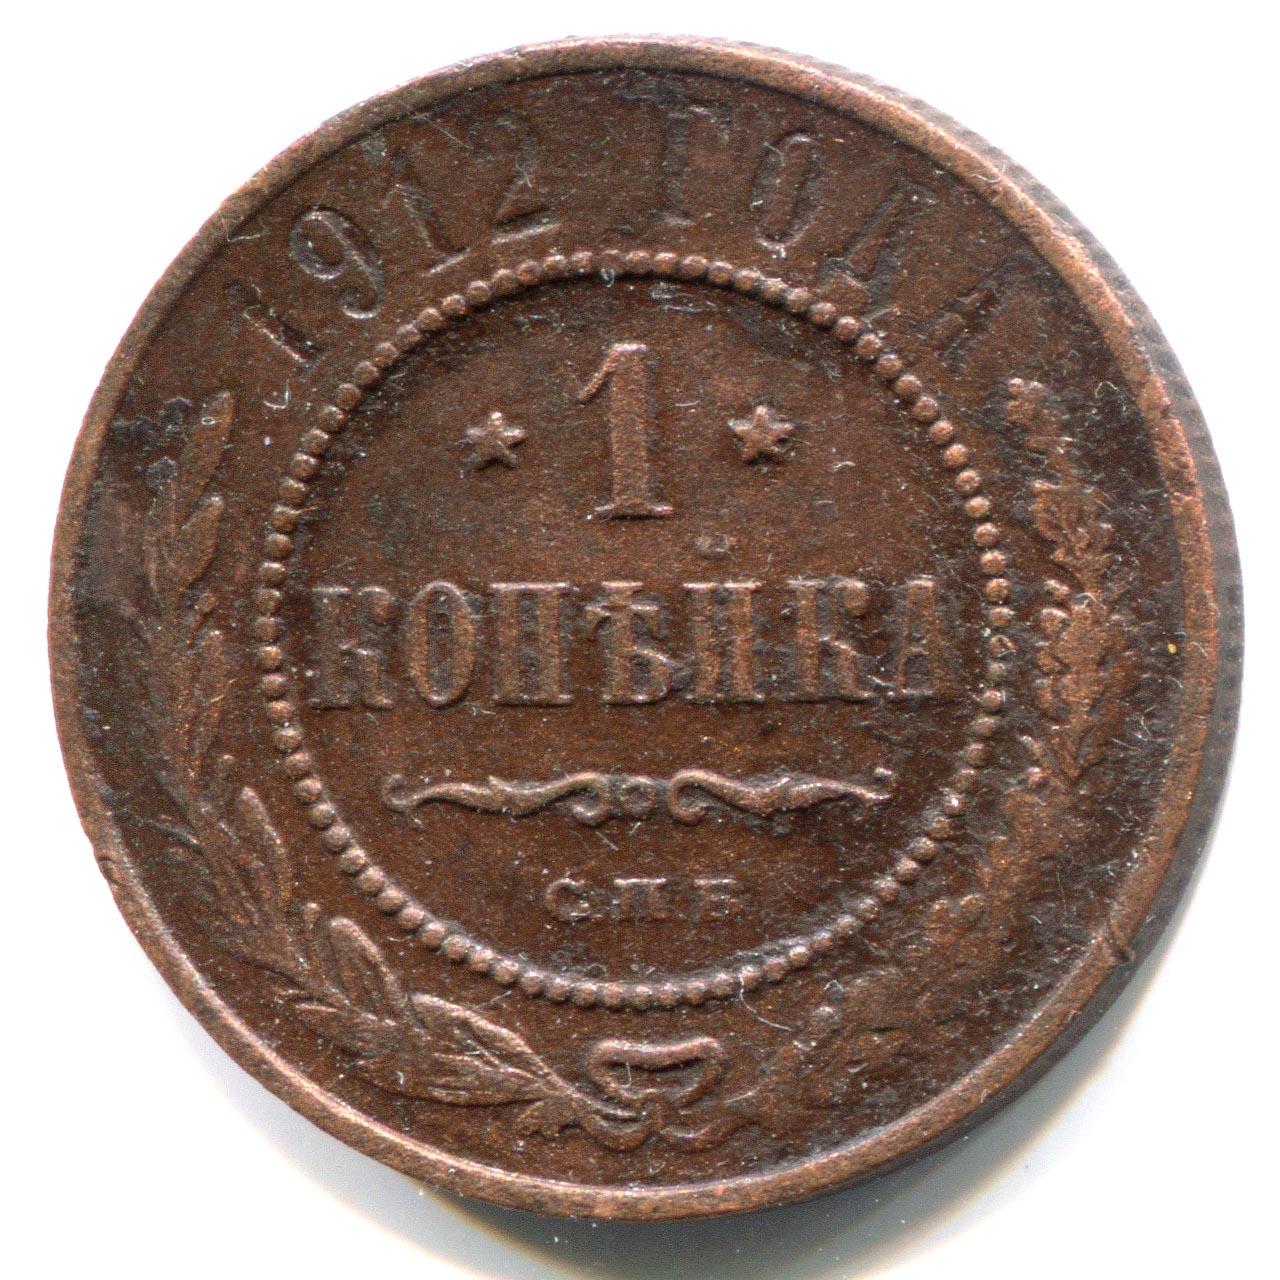 Цена одной копейки 1912 года цена николаевского червонца